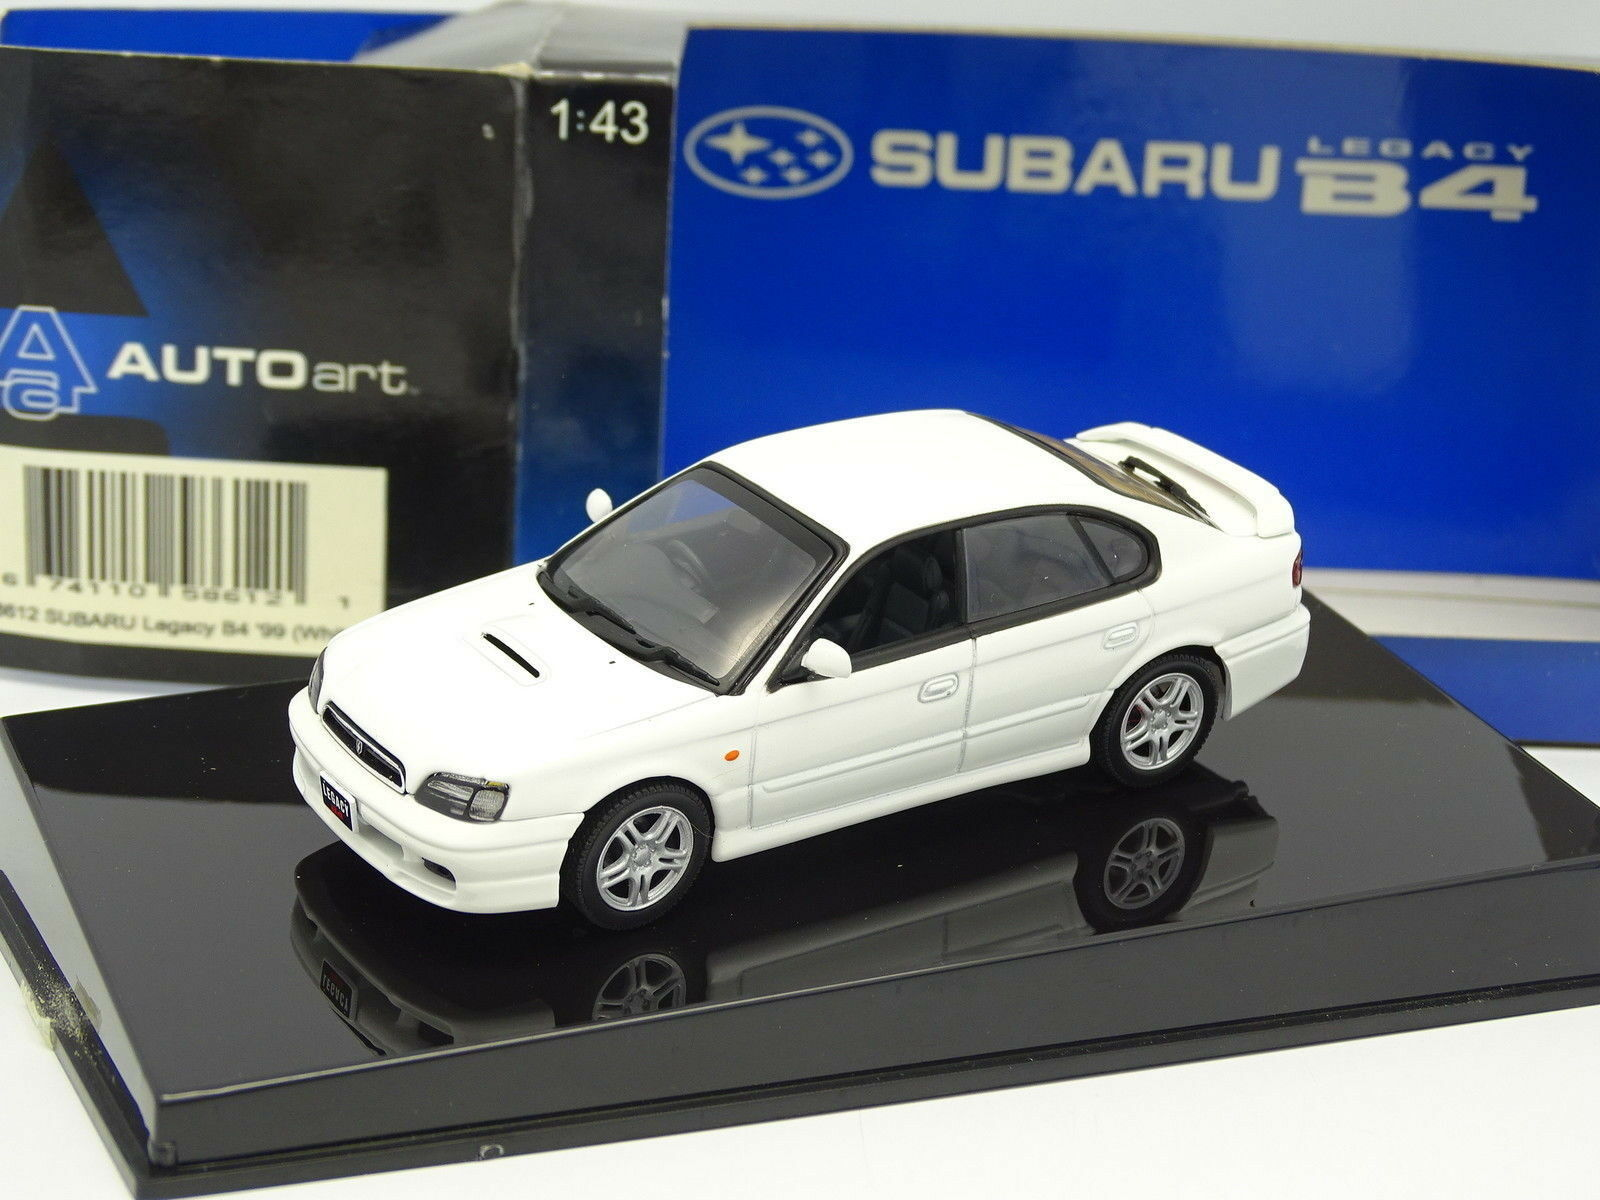 Auto Art 1 43 - Subaru Legacy B4 1999 blancoo